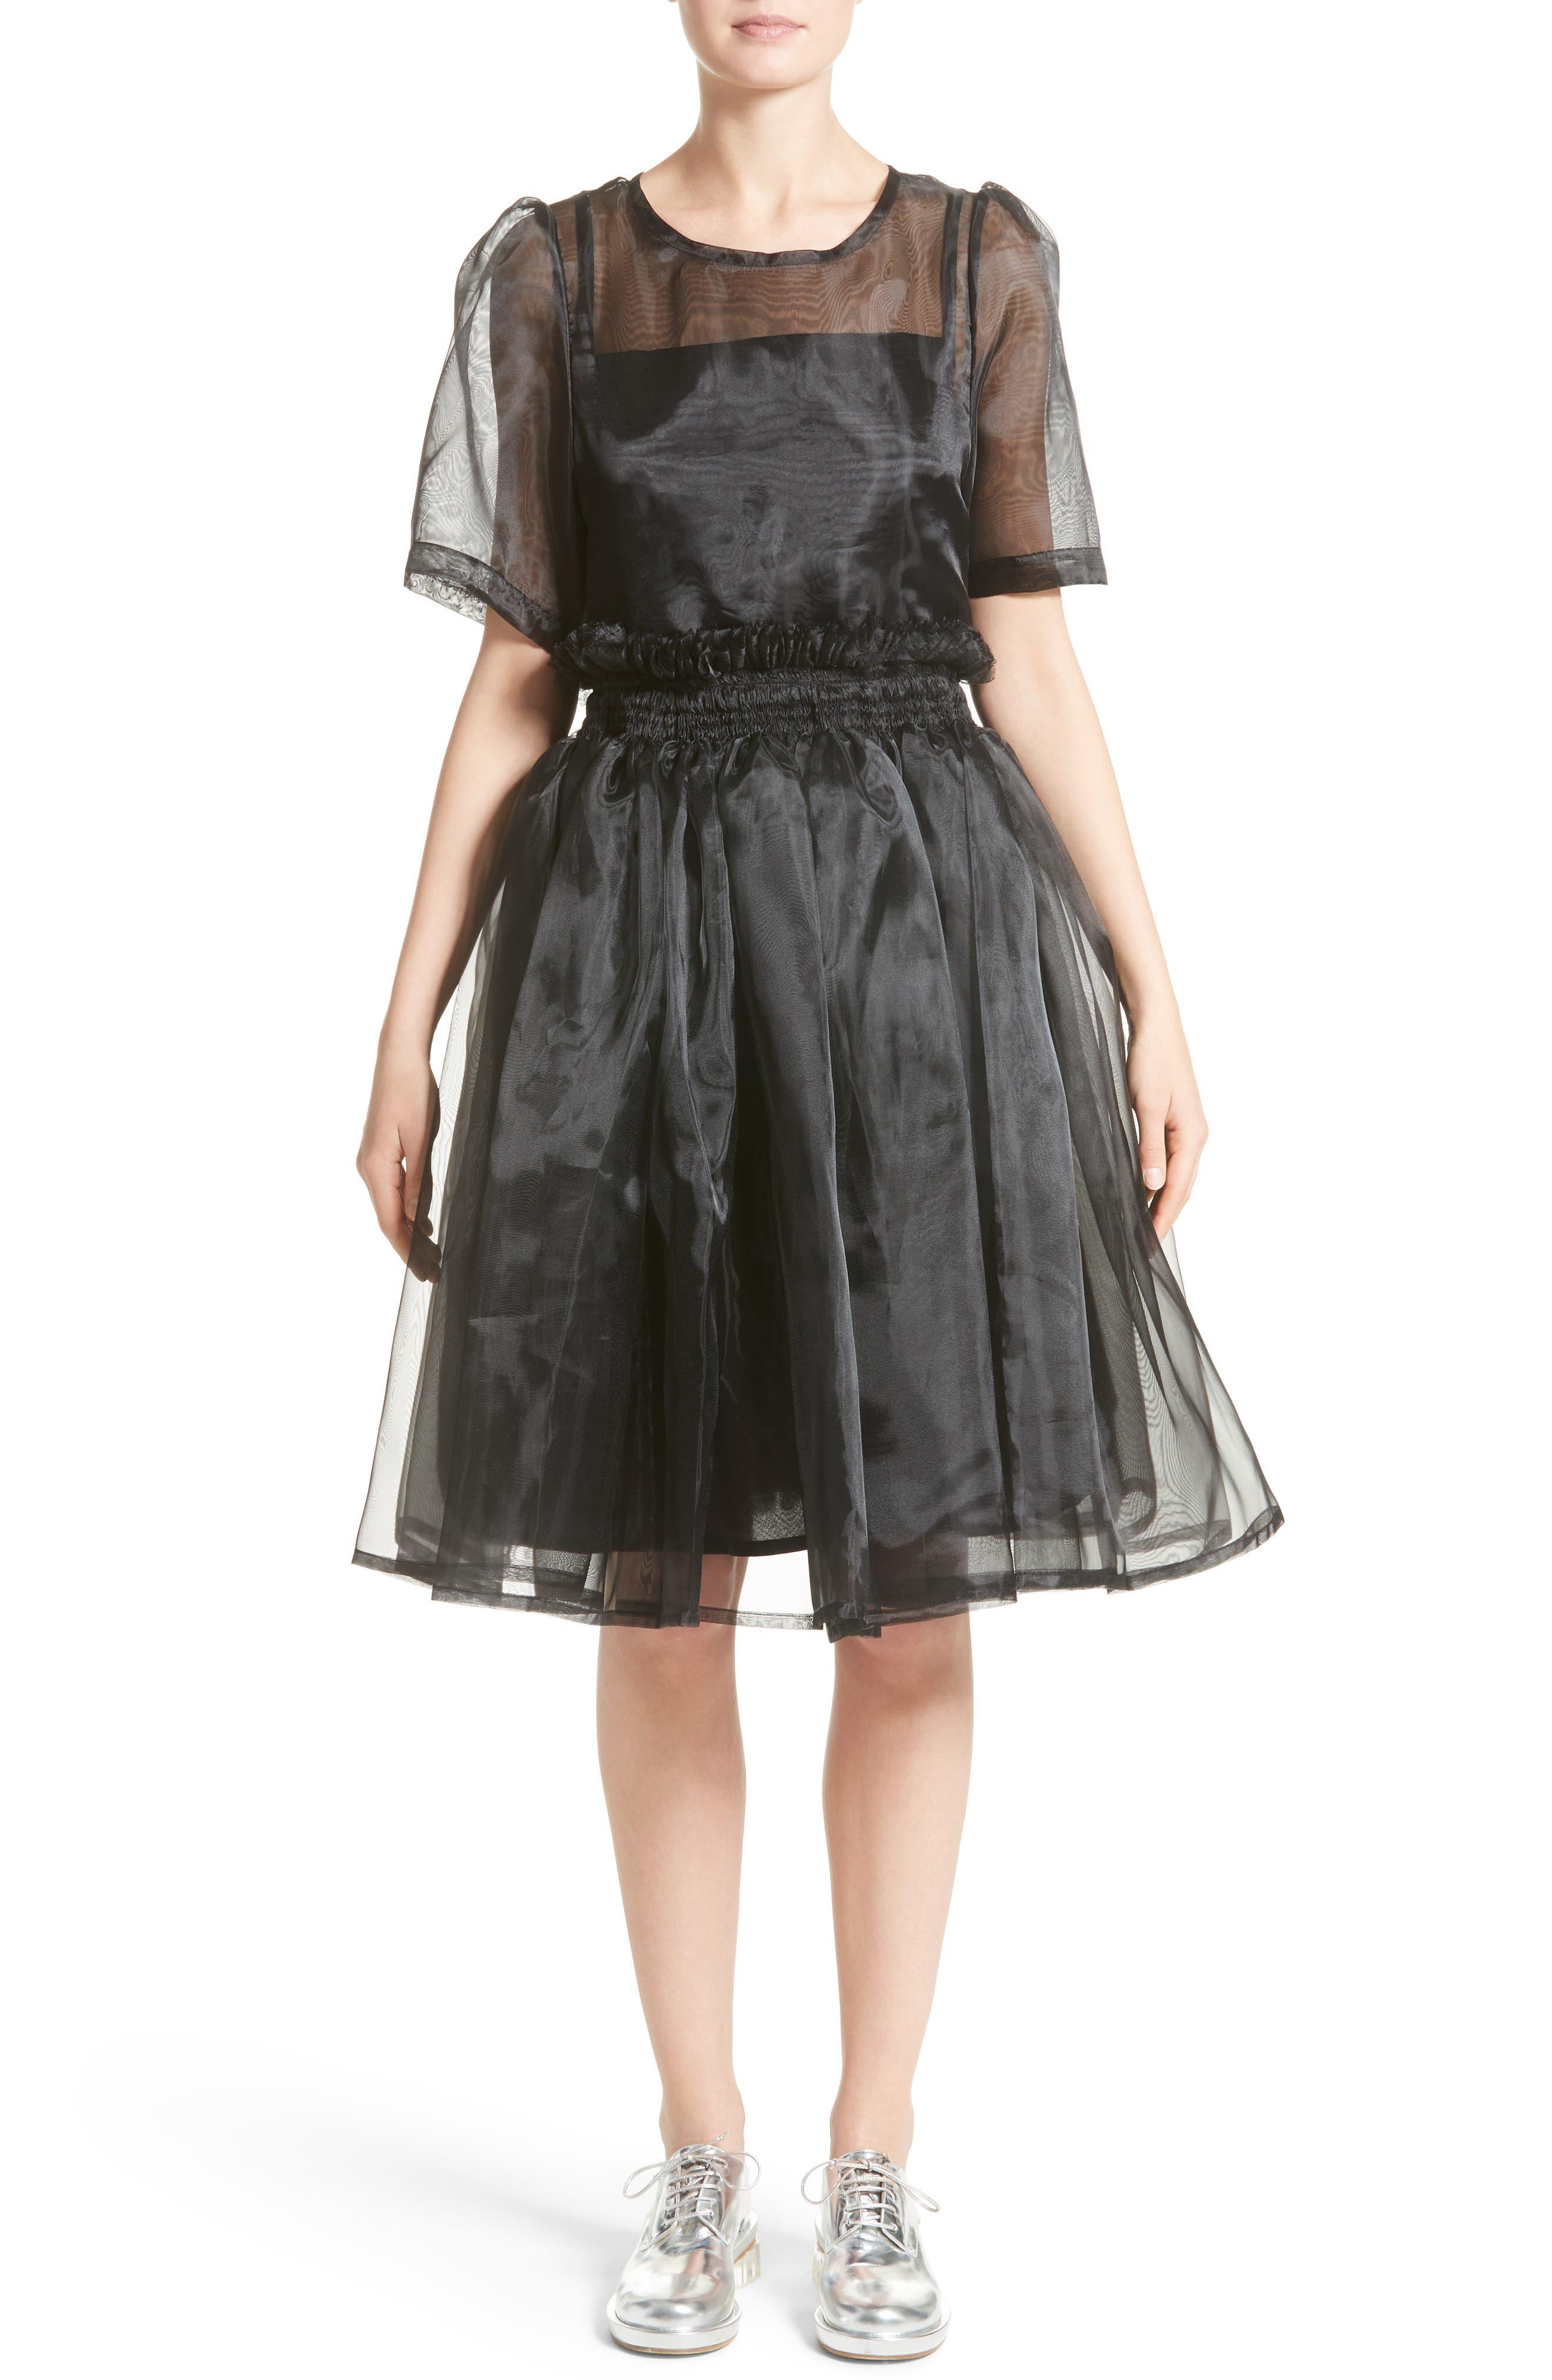 Molly Goddard Addison Tulle Dress